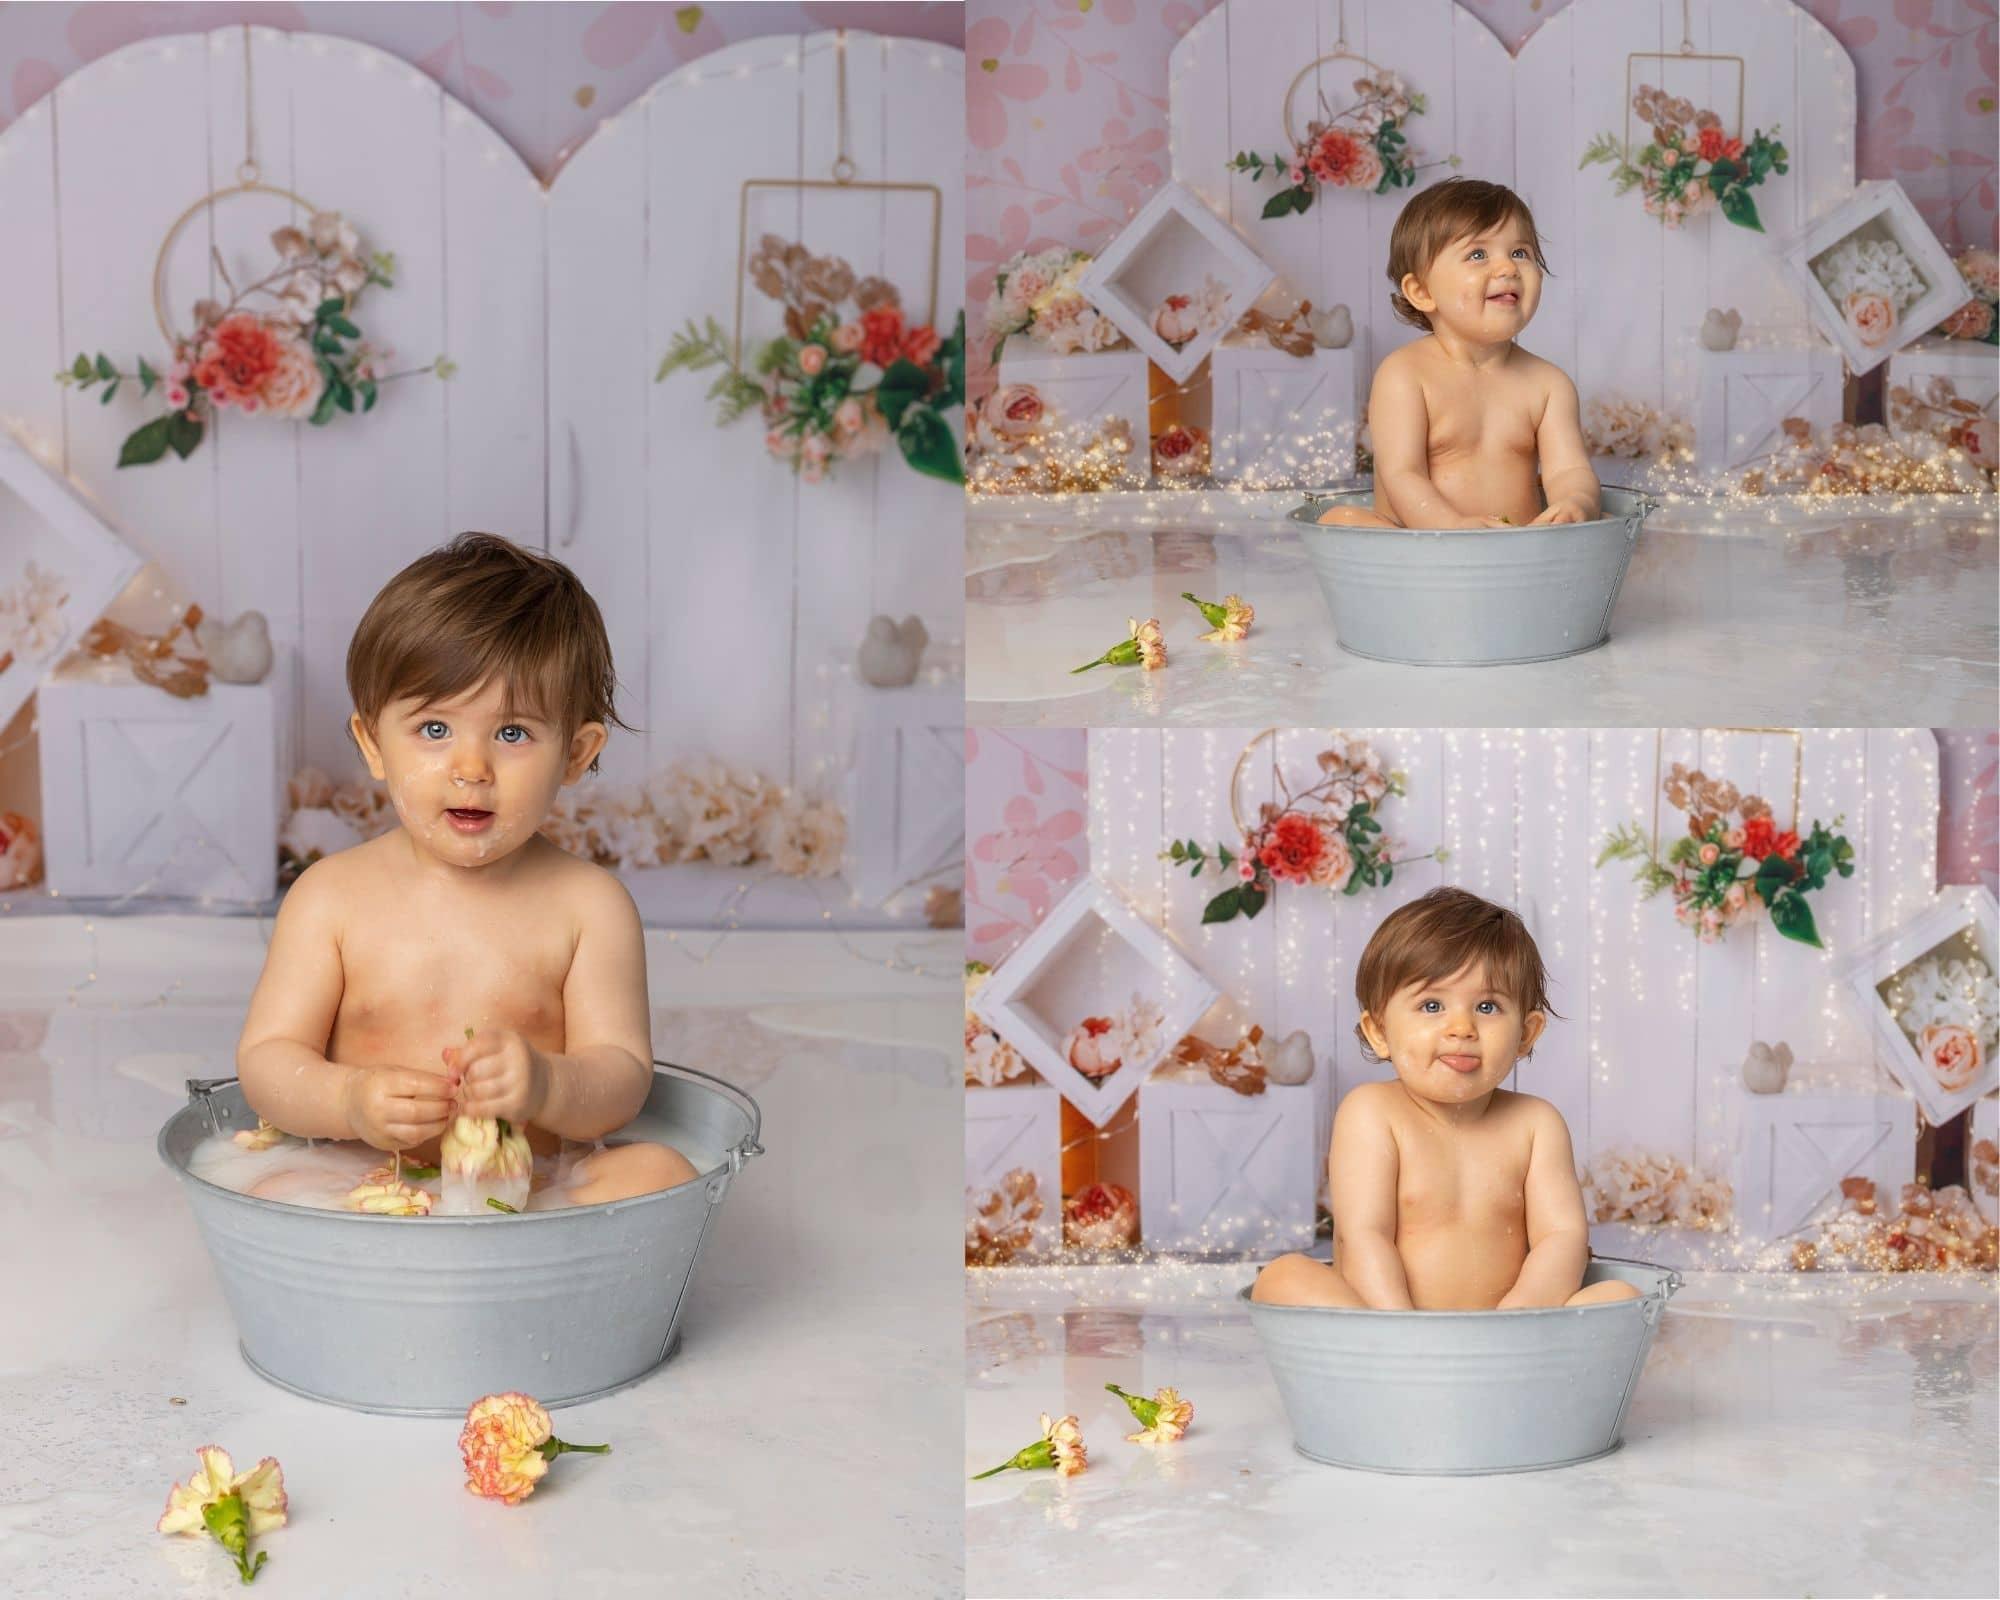 photographe-bebe-seance-smas-the-cake-strasbourg-clover-photographies-4